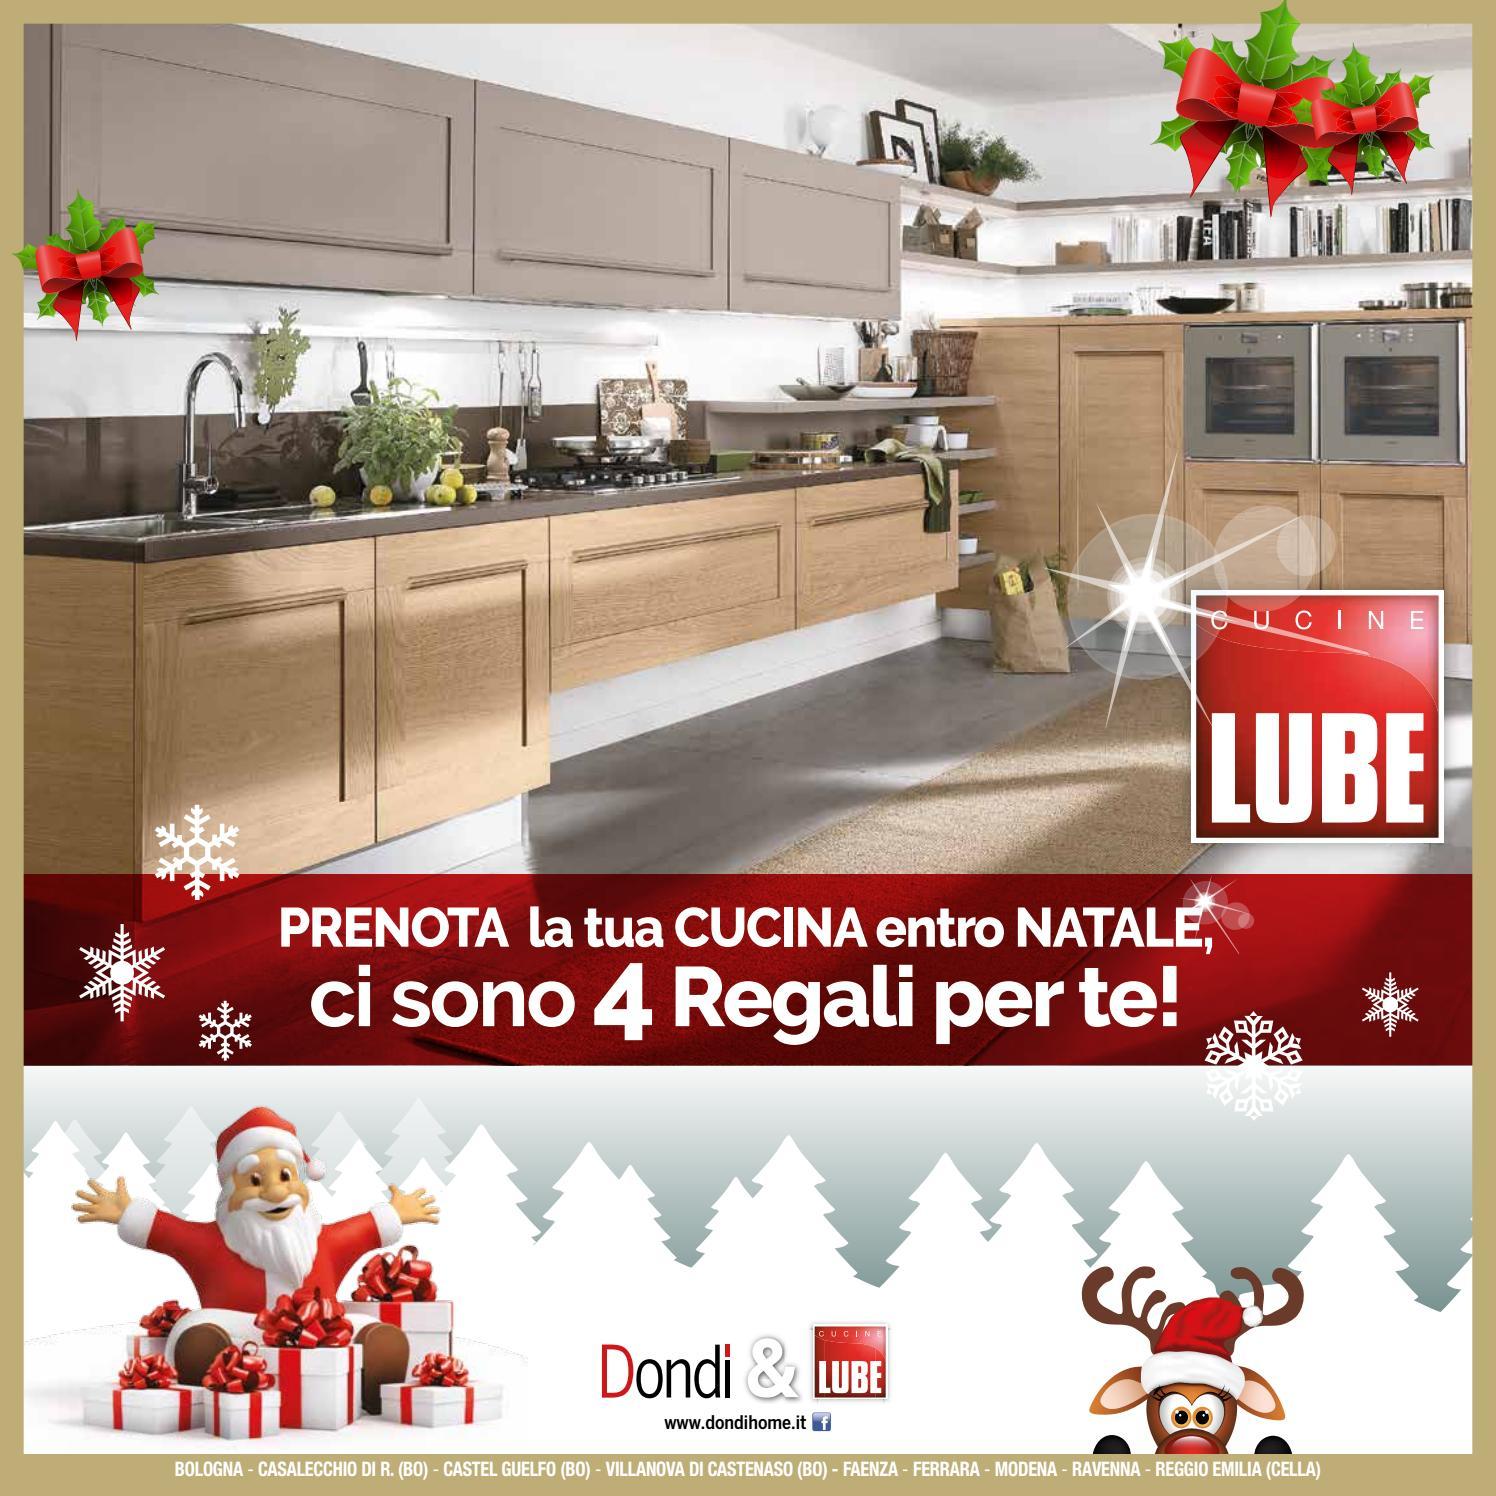 Lube Cucine Natale 2017 by Michele Travagli - issuu